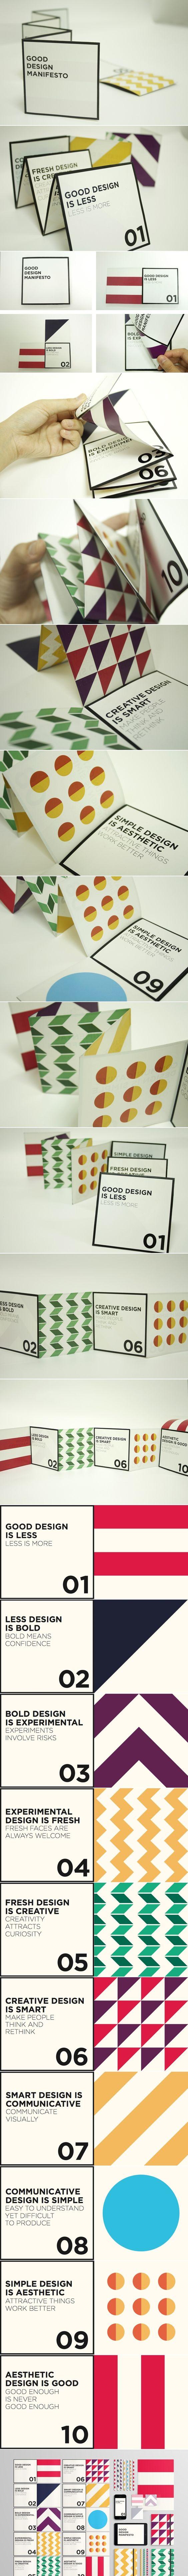 Good Design Manifesto  Platt Grupo Impresor les desea FELIZ DÍA! www.platt-grupoimpresor.com